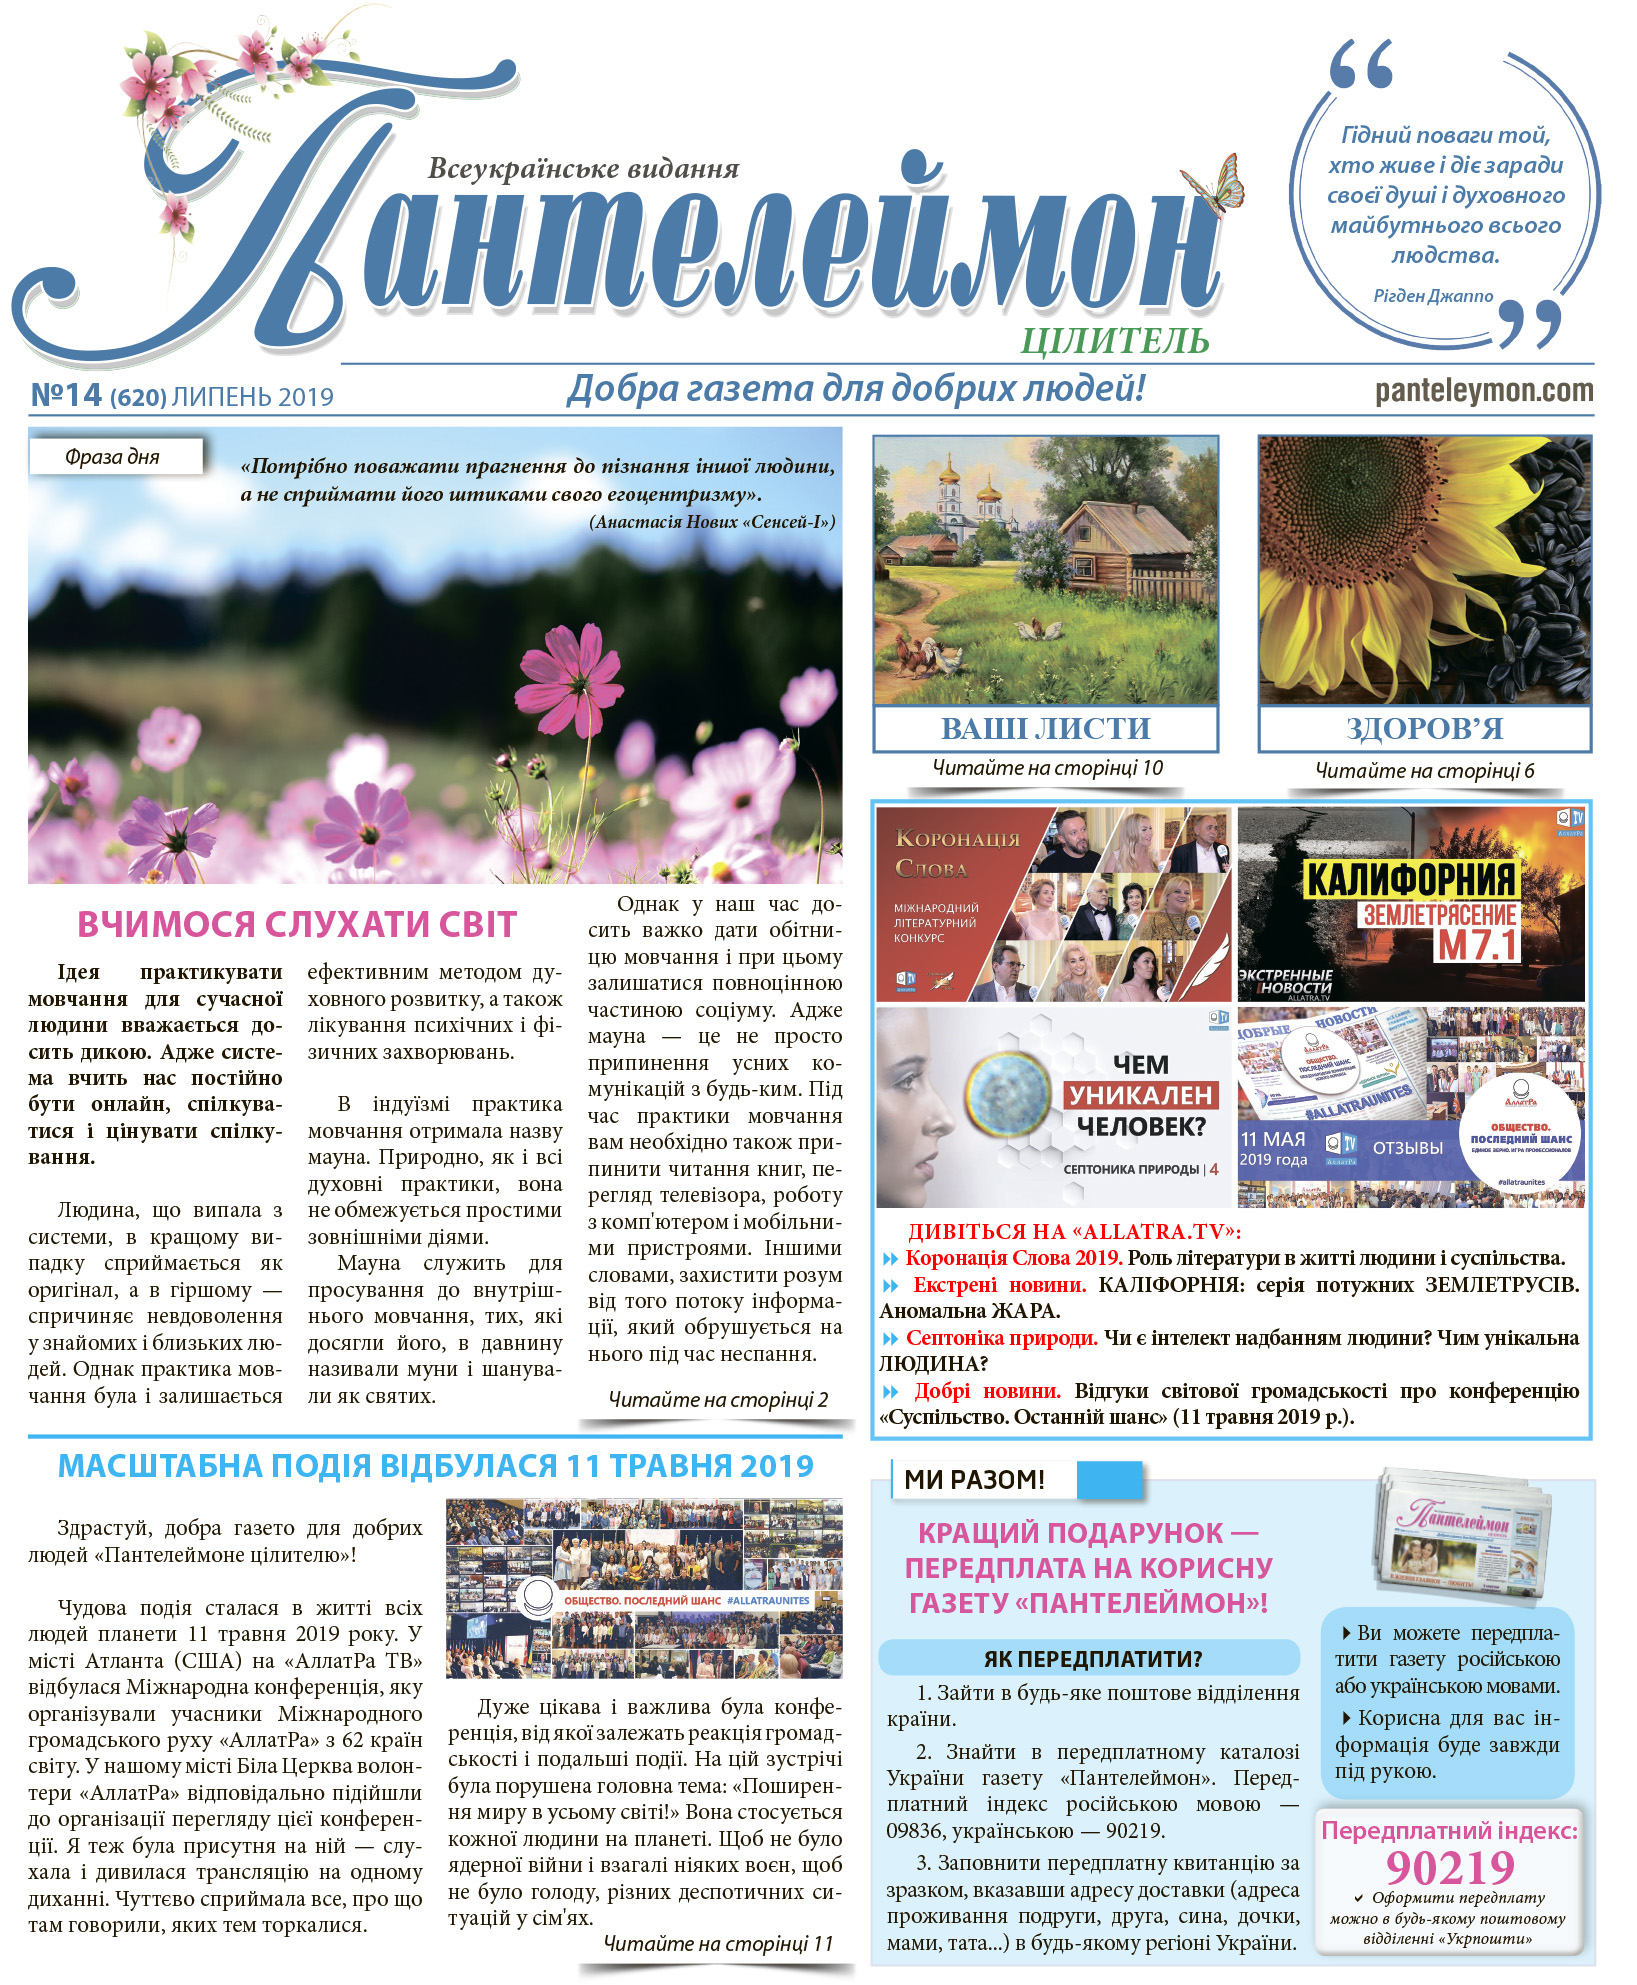 Пантелеймон №14 (620) липень 2019 року